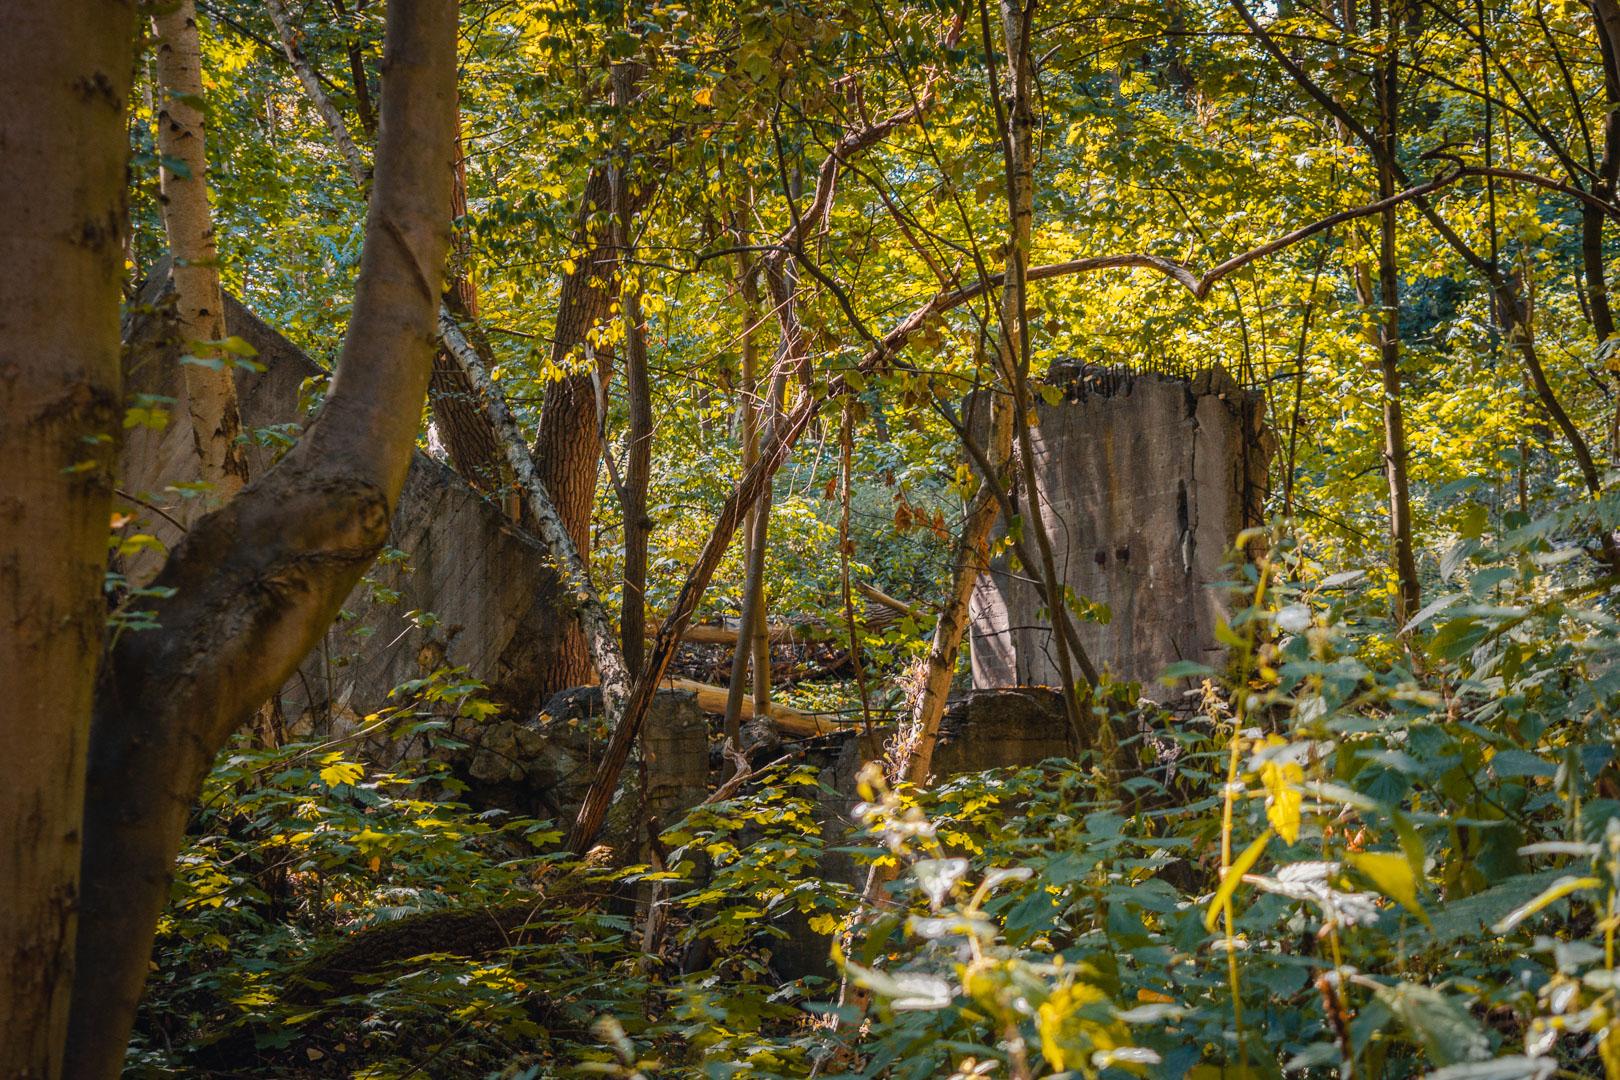 Ruine-im-Wald-Kruemmel